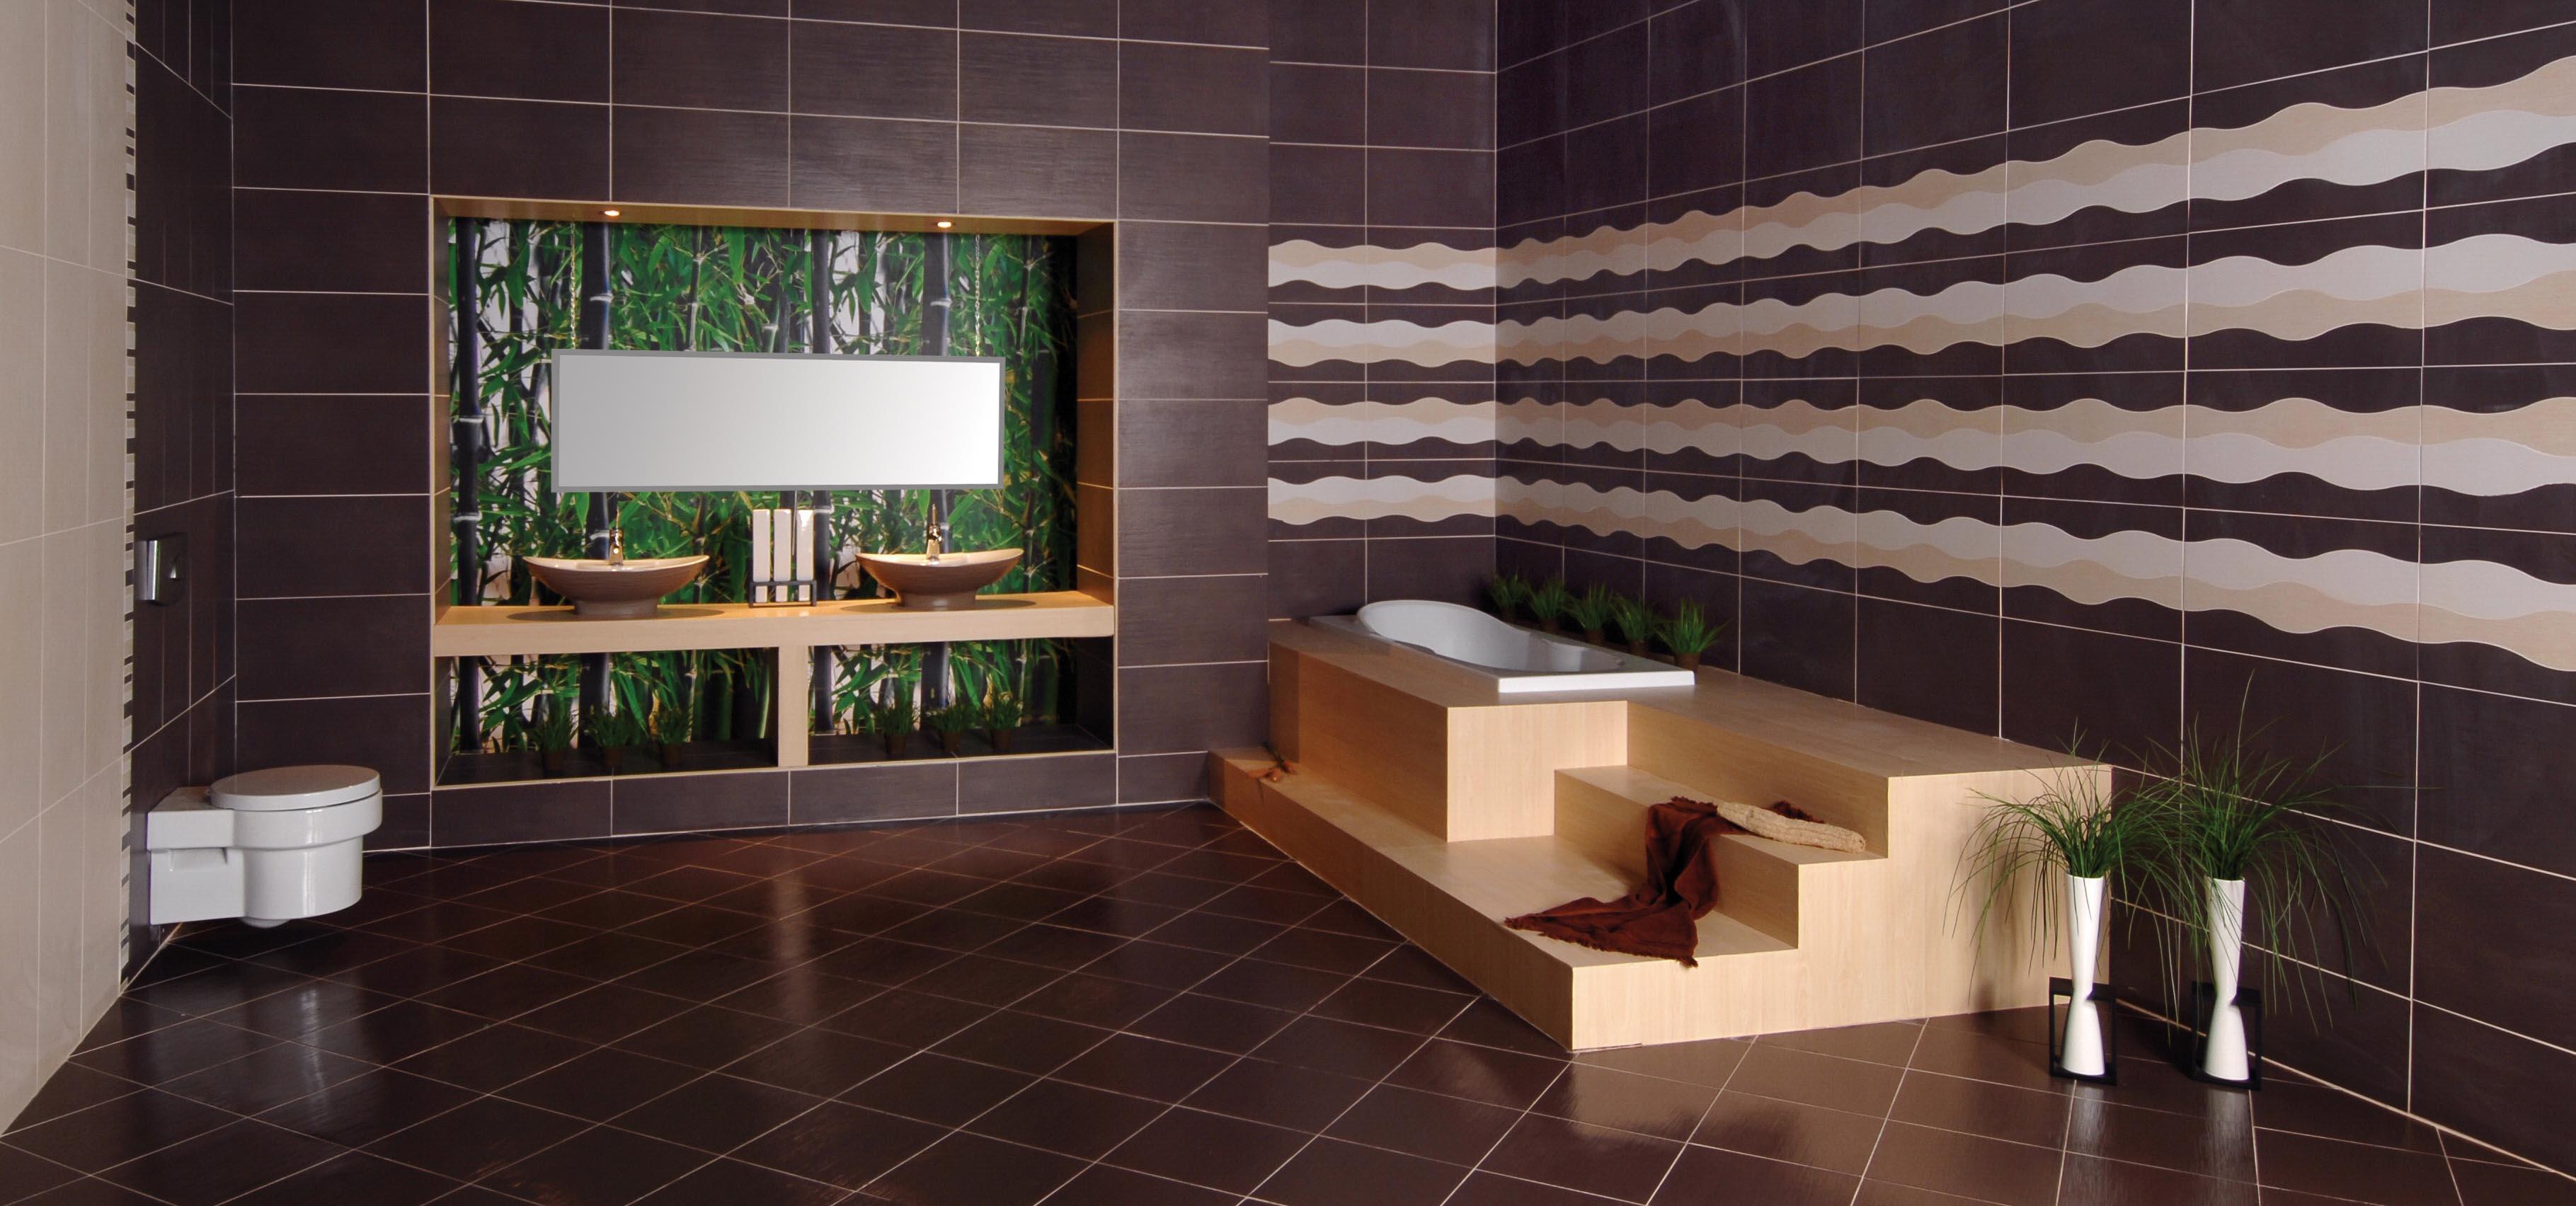 10 modern banyo dekorasyon nerisi dekorstore 2018 - Banyo dekorasyon ...